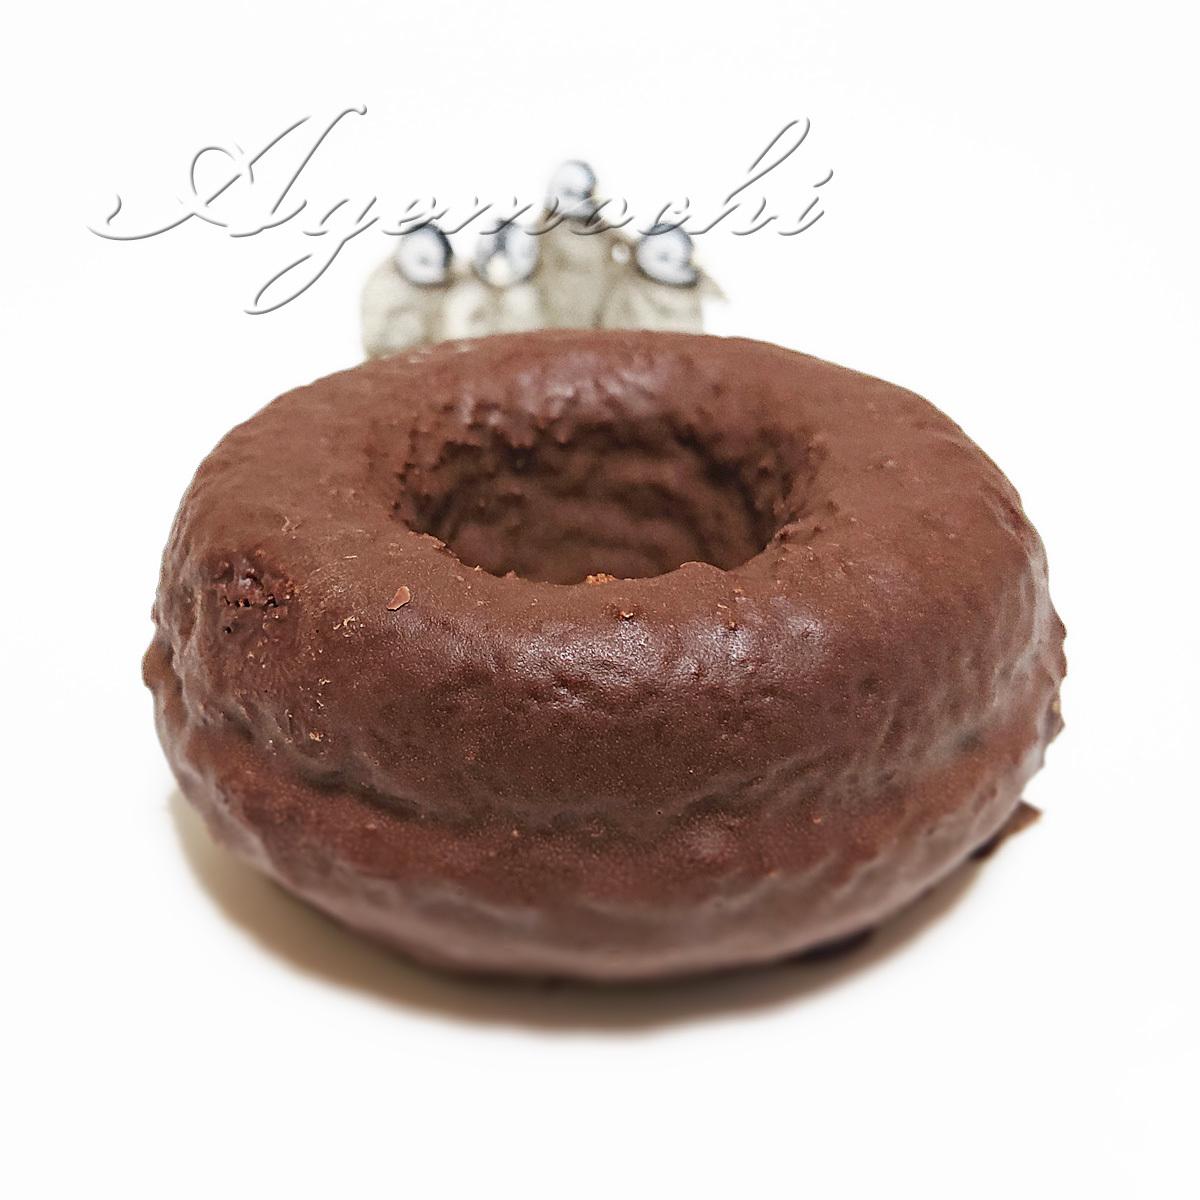 bonvivant_donuts.jpg